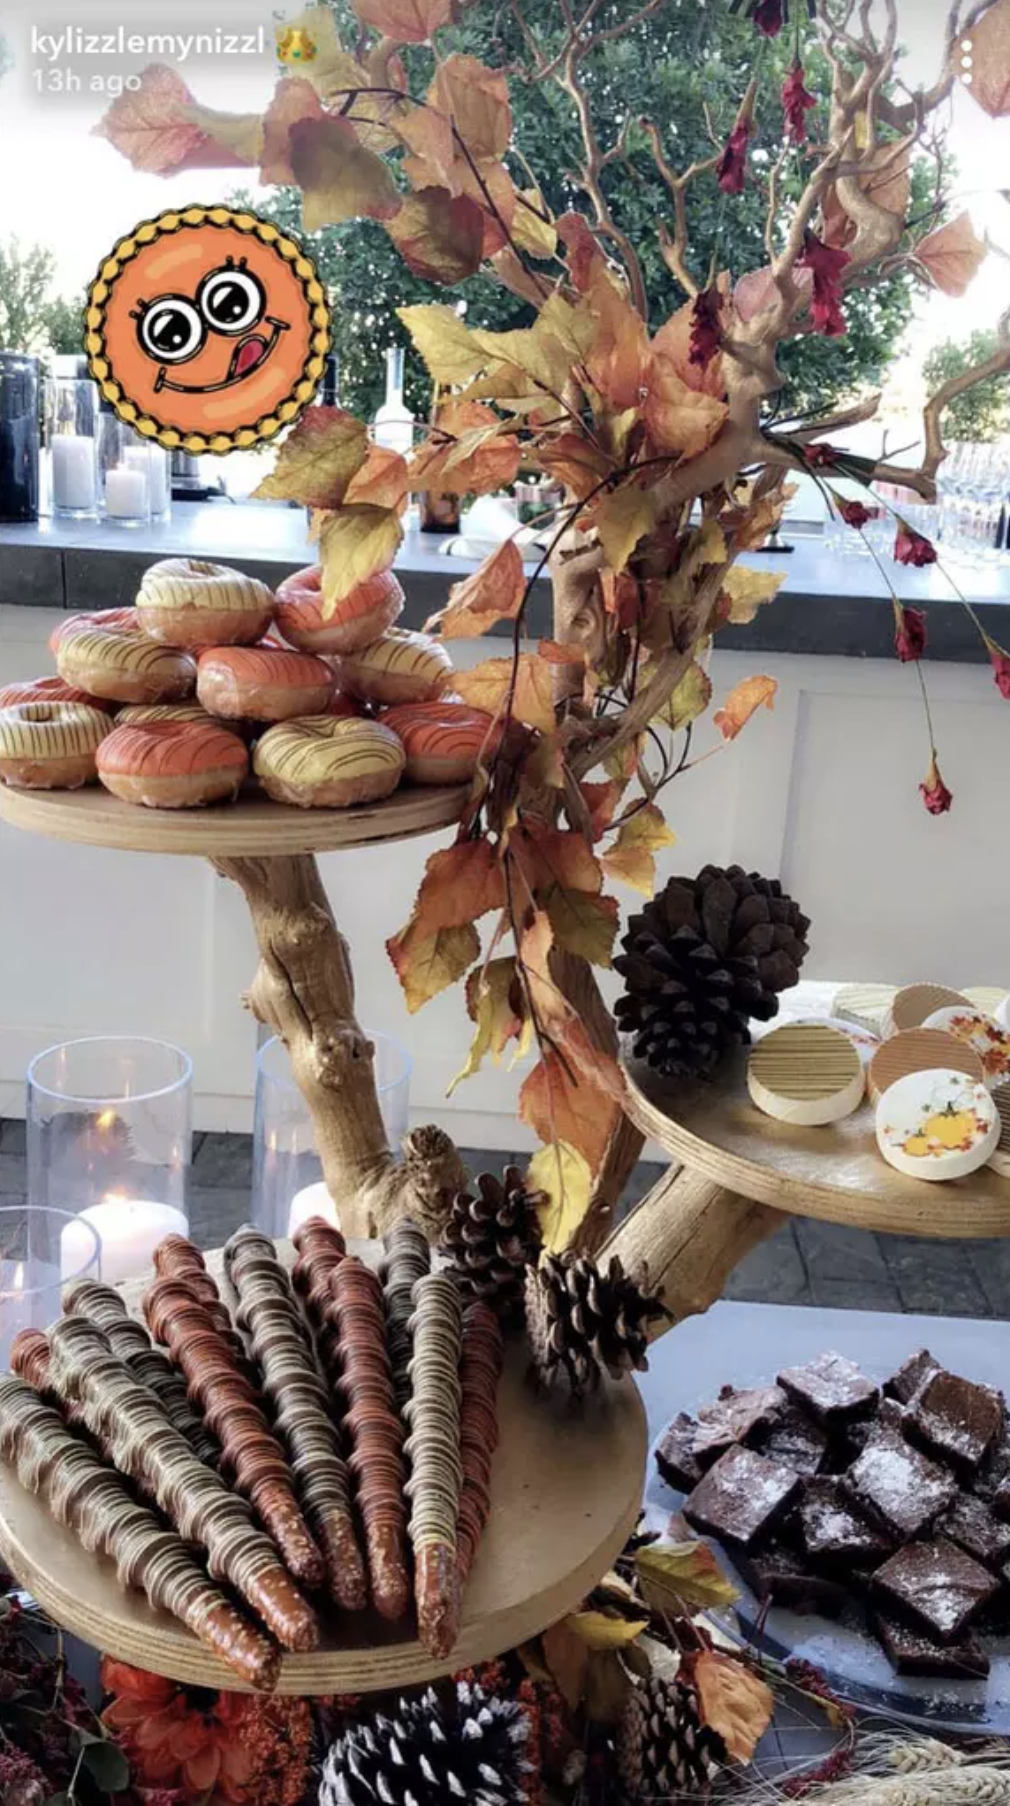 Kardashian Thanksgiving Recipes And Decorating Tips: The Kardashian Thanksgiving Looked Like Cinderella's Wedding